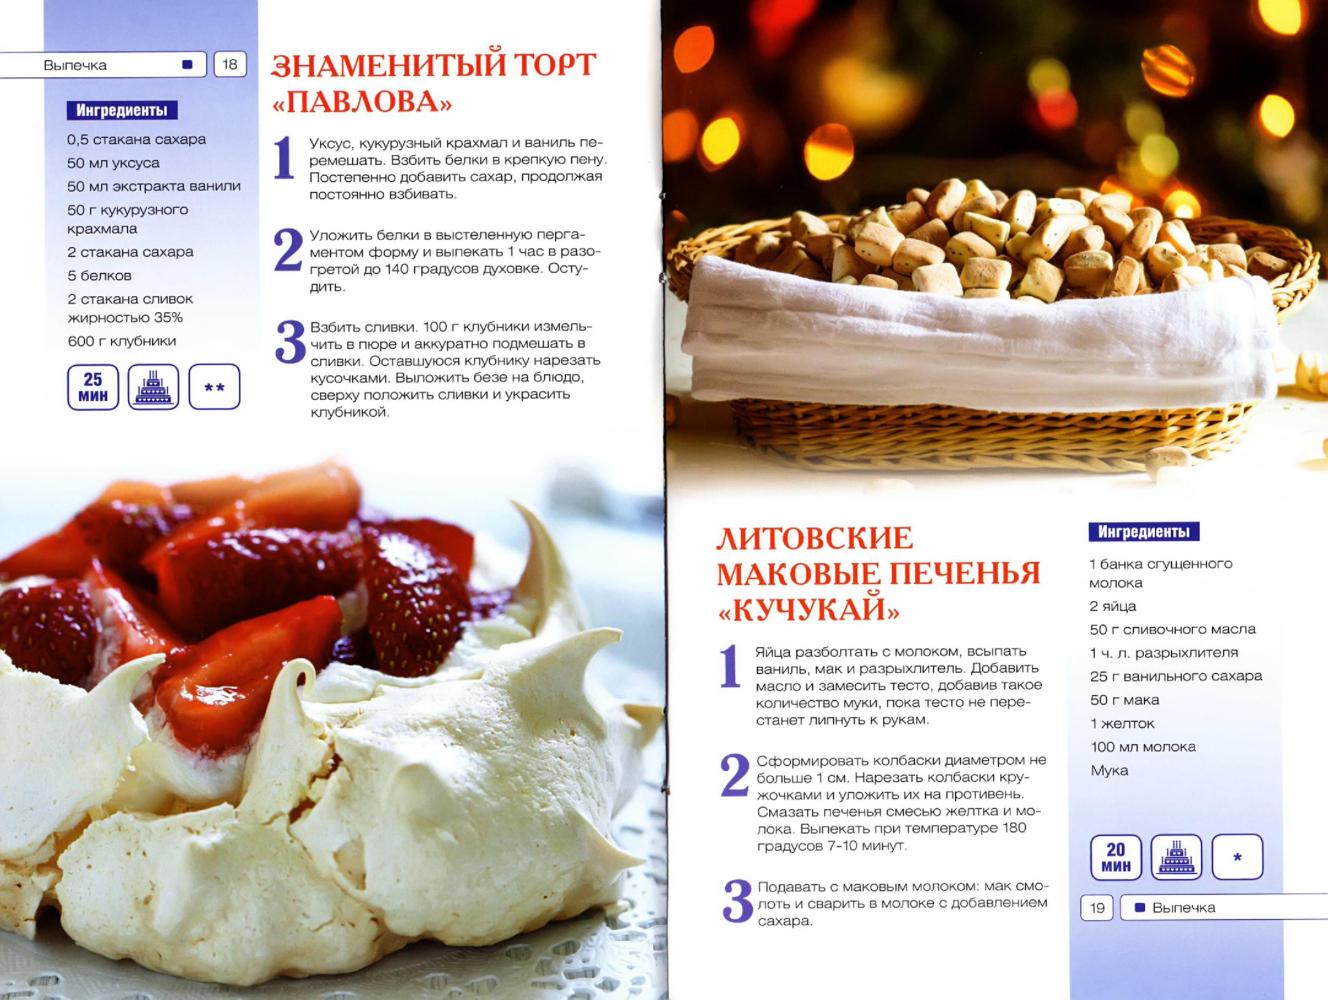 http://i1.imageban.ru/out/2013/12/20/aa647710a5cc28ee793eacb204637ab3.jpg